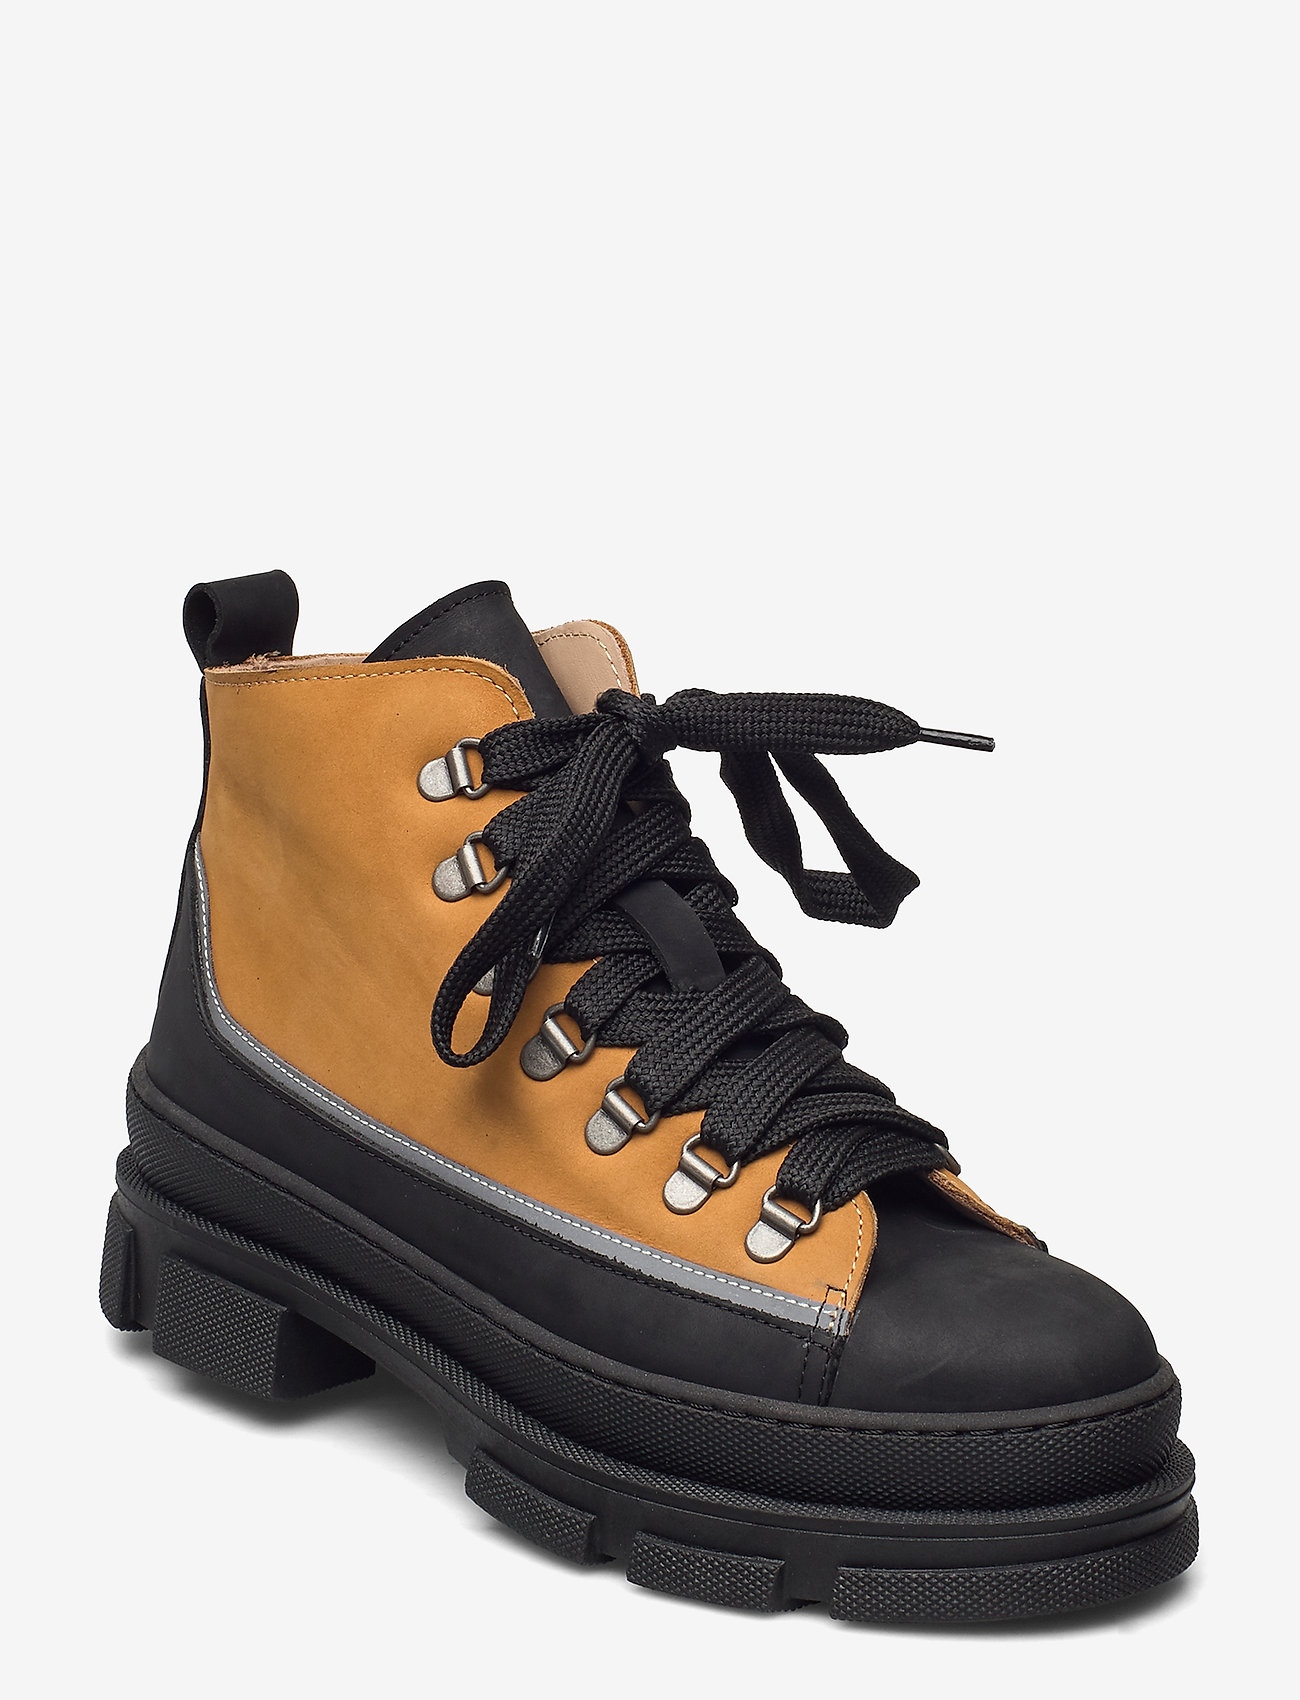 ANGULUS - Boots - flat - flache stiefeletten - 1205/2012/1262 black/reflex/ca - 0